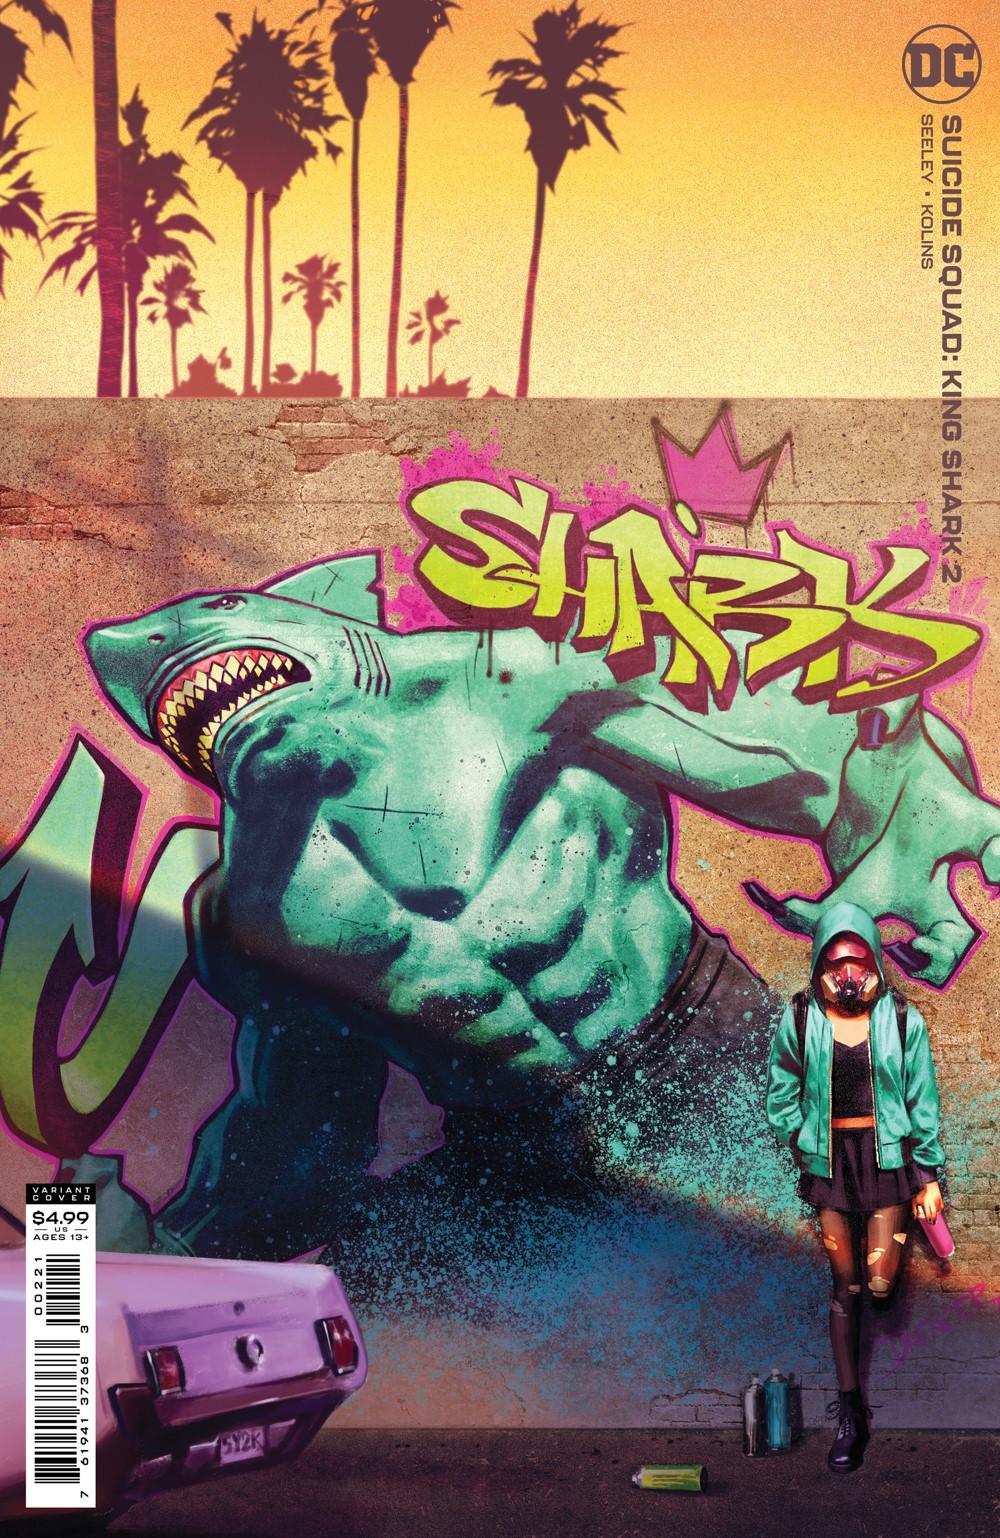 SSKS_Cv2_var_00221 DC Comics October 2021 Solicitations